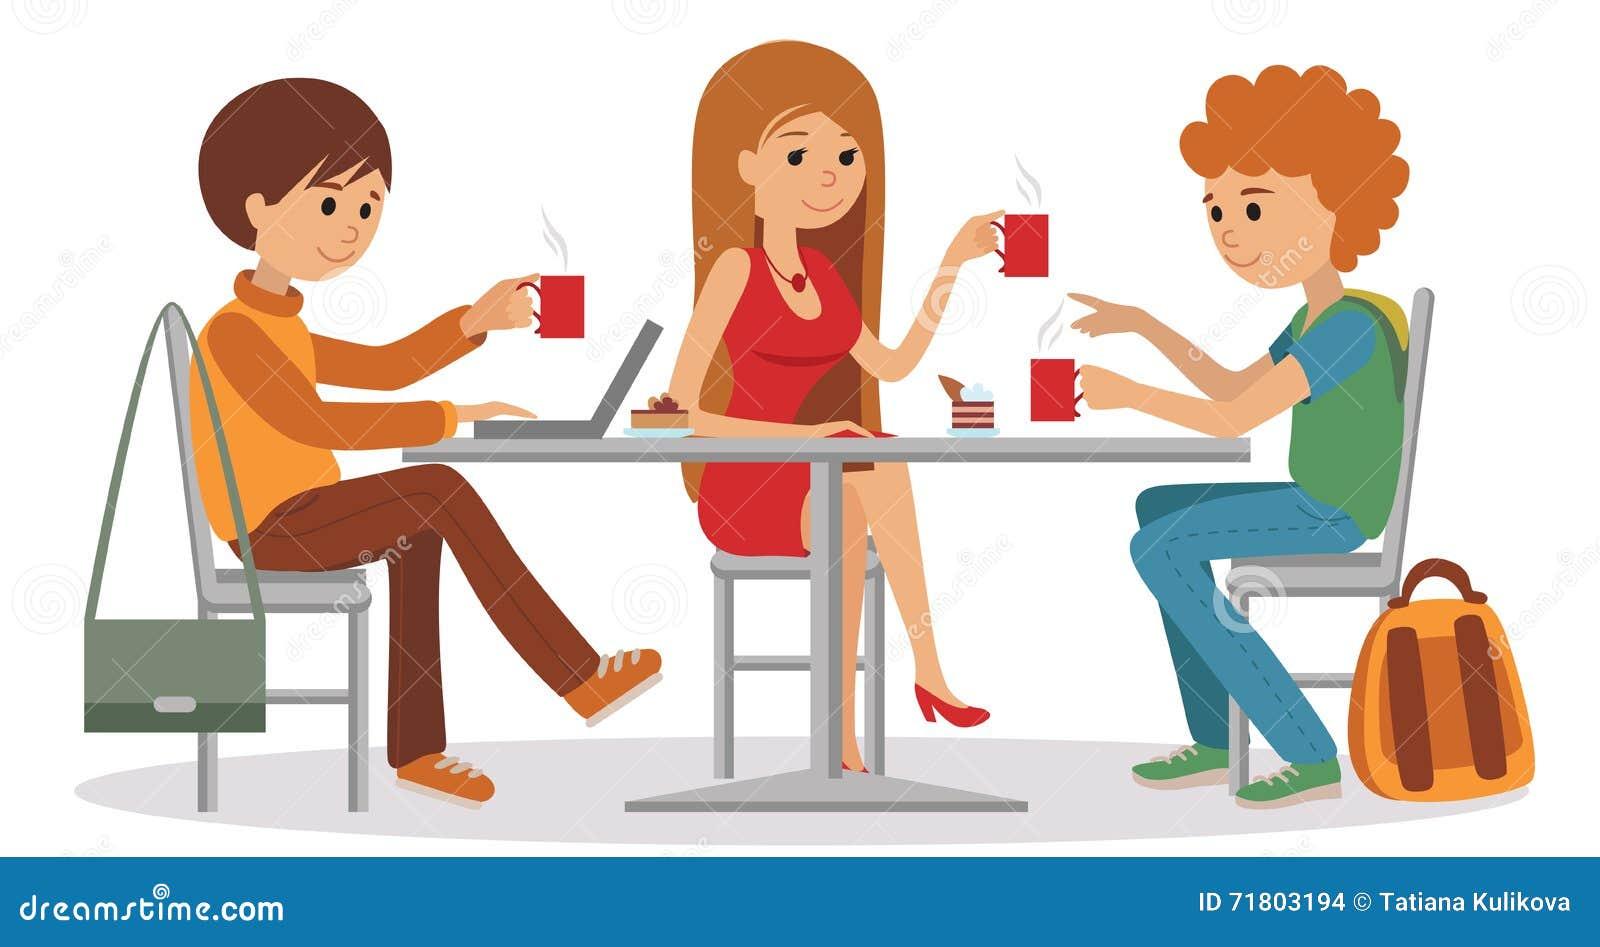 Hot Girl Talking On Phone - Hot Girls Wallpaper